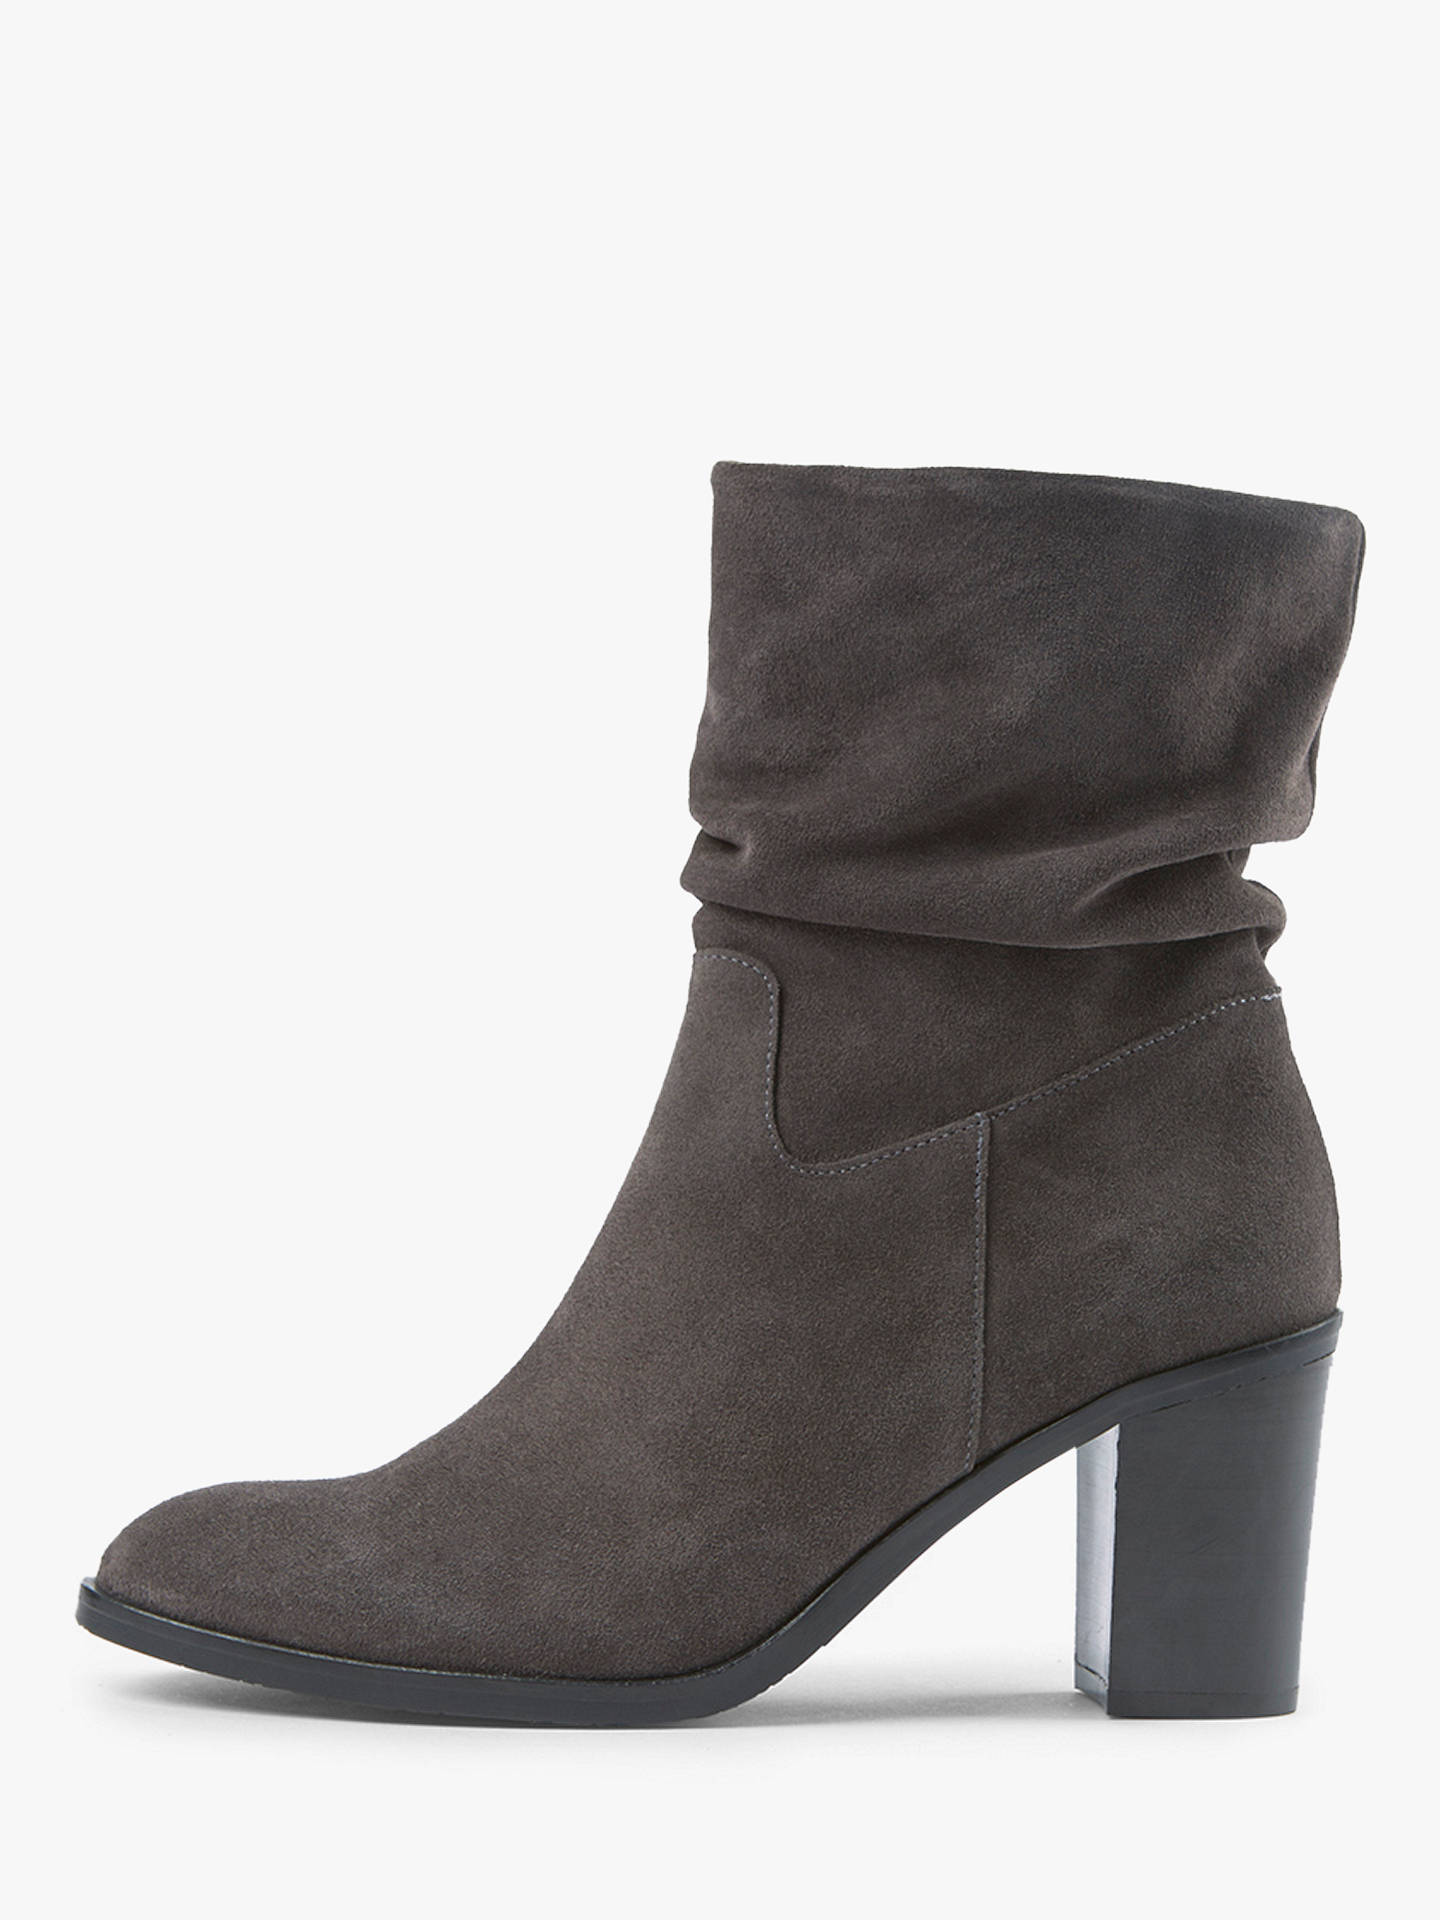 92bb66a258 Buy Mint Velvet Eve Slouchy Mid Calf Block Heel Boots, Charcoal Suede, 3  Online ...